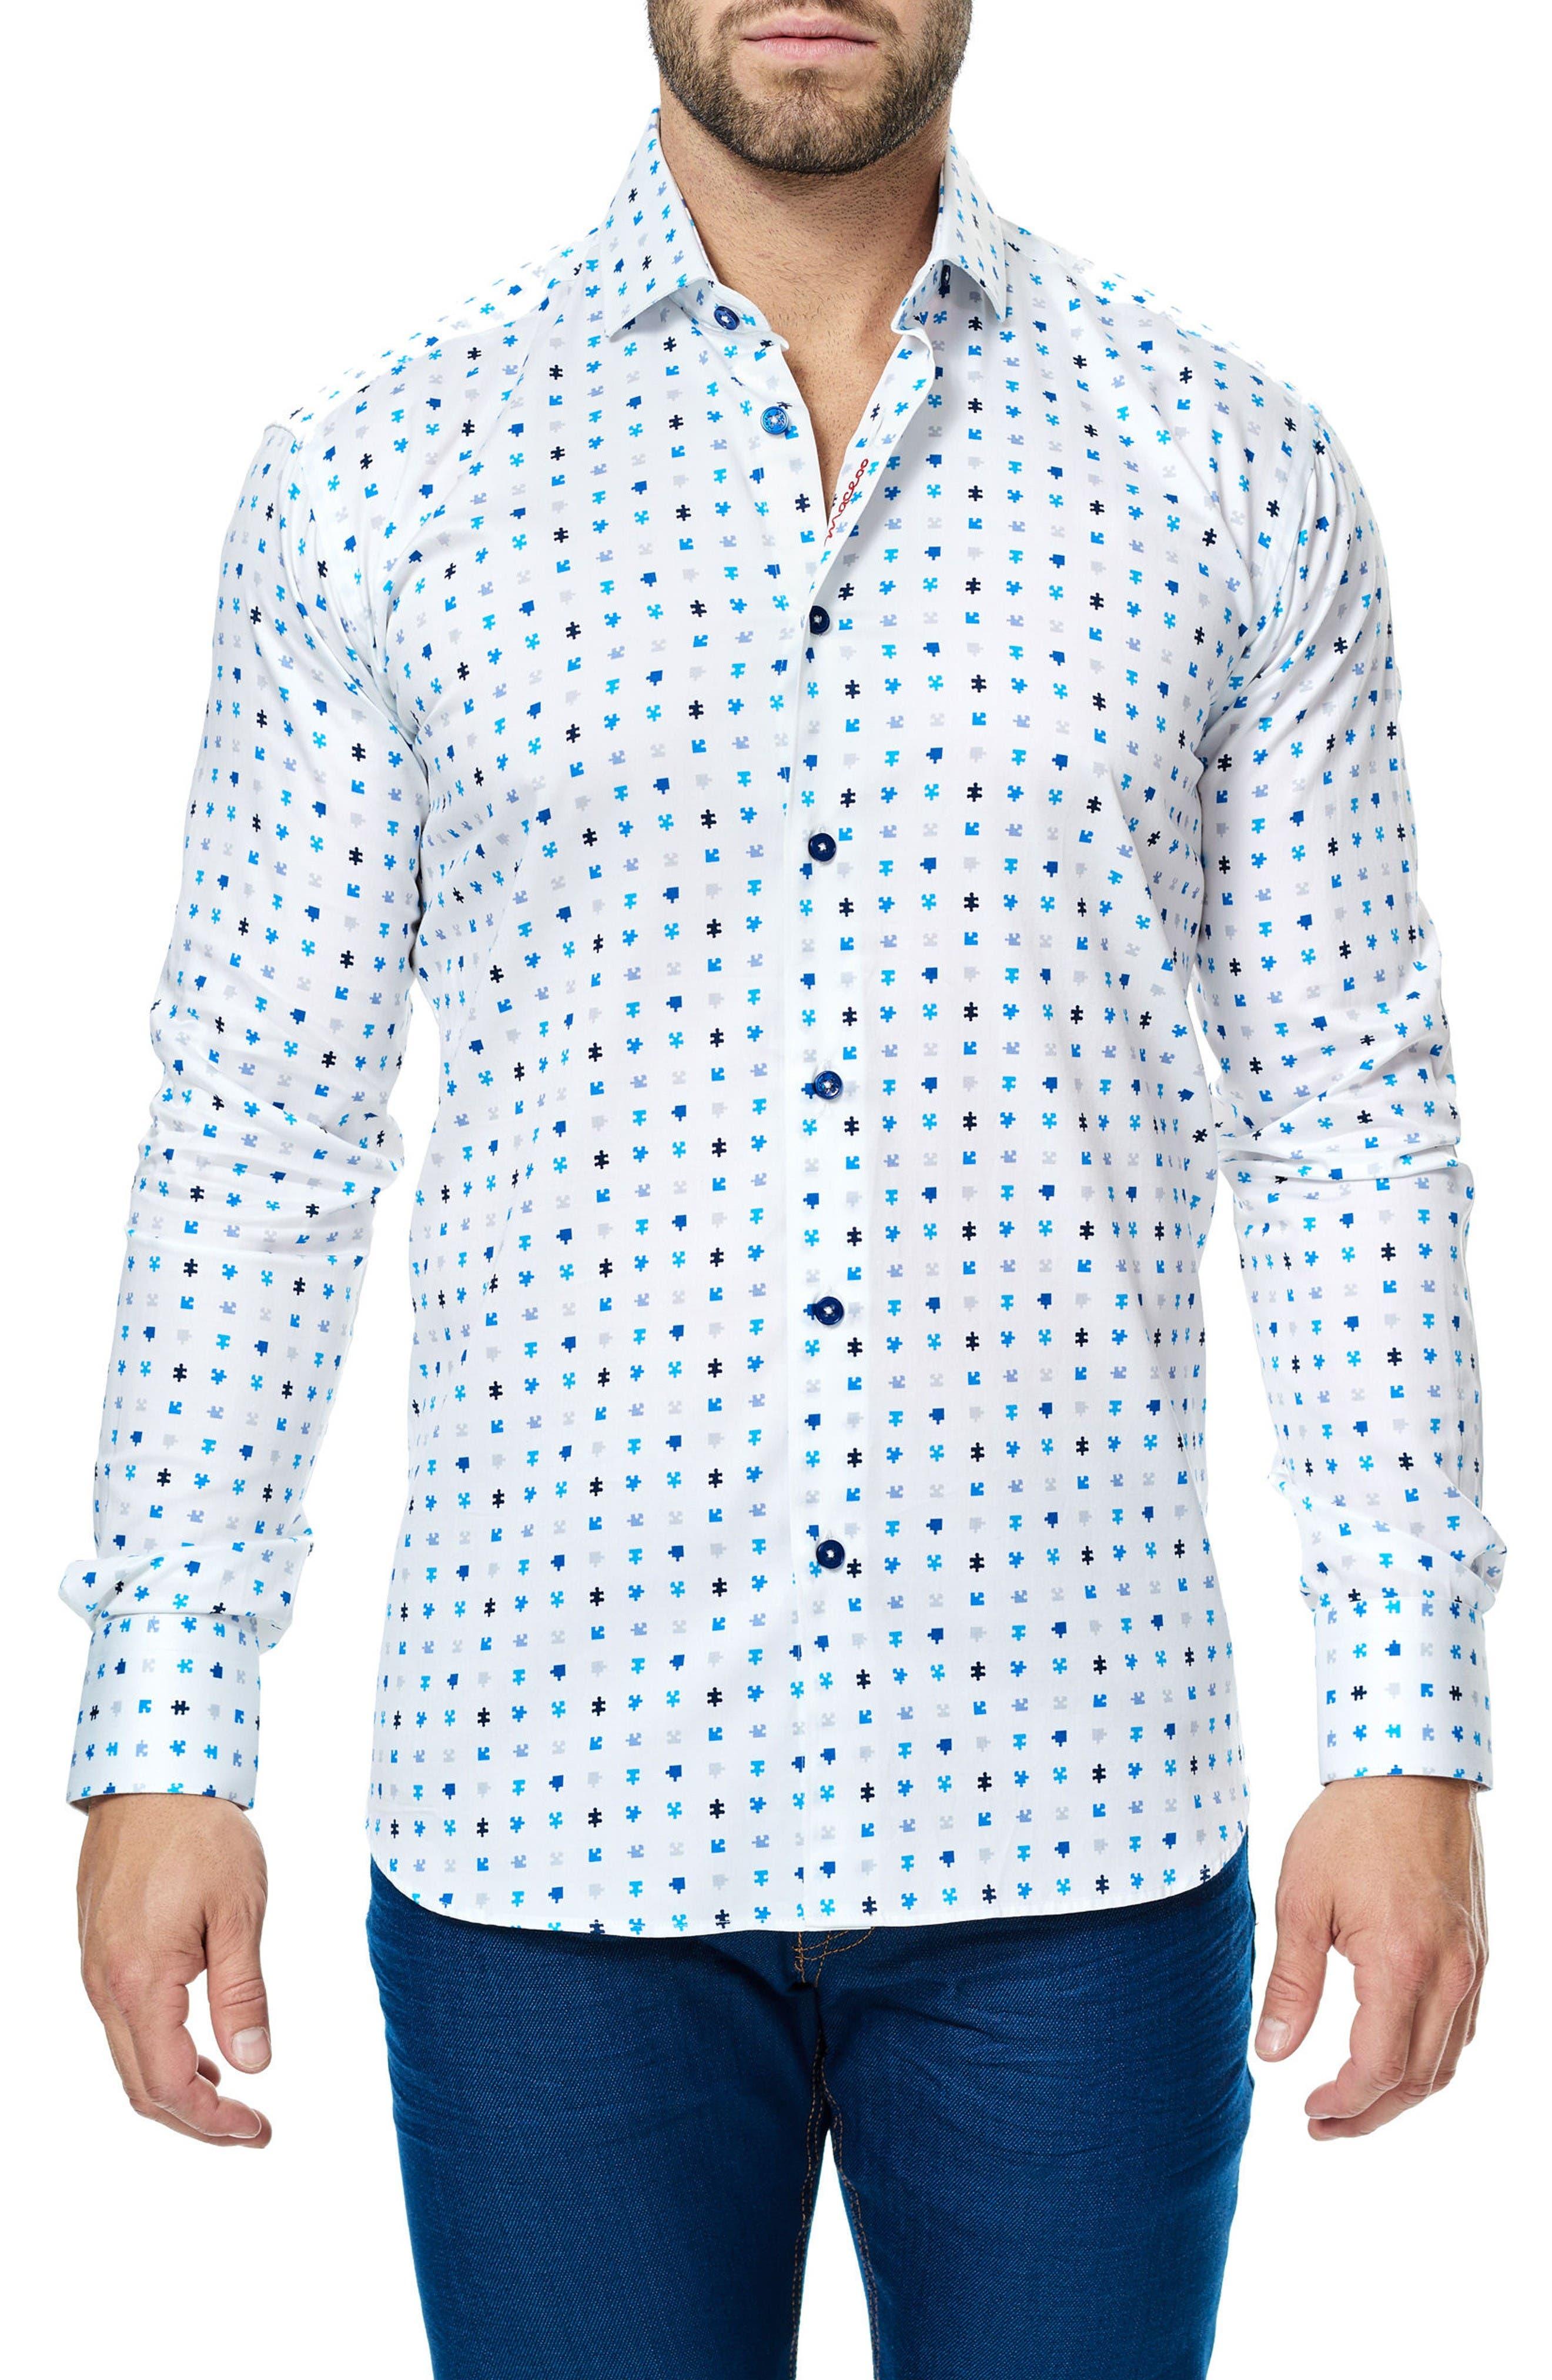 Maceoo Luxor Puzzle Print Sport Shirt